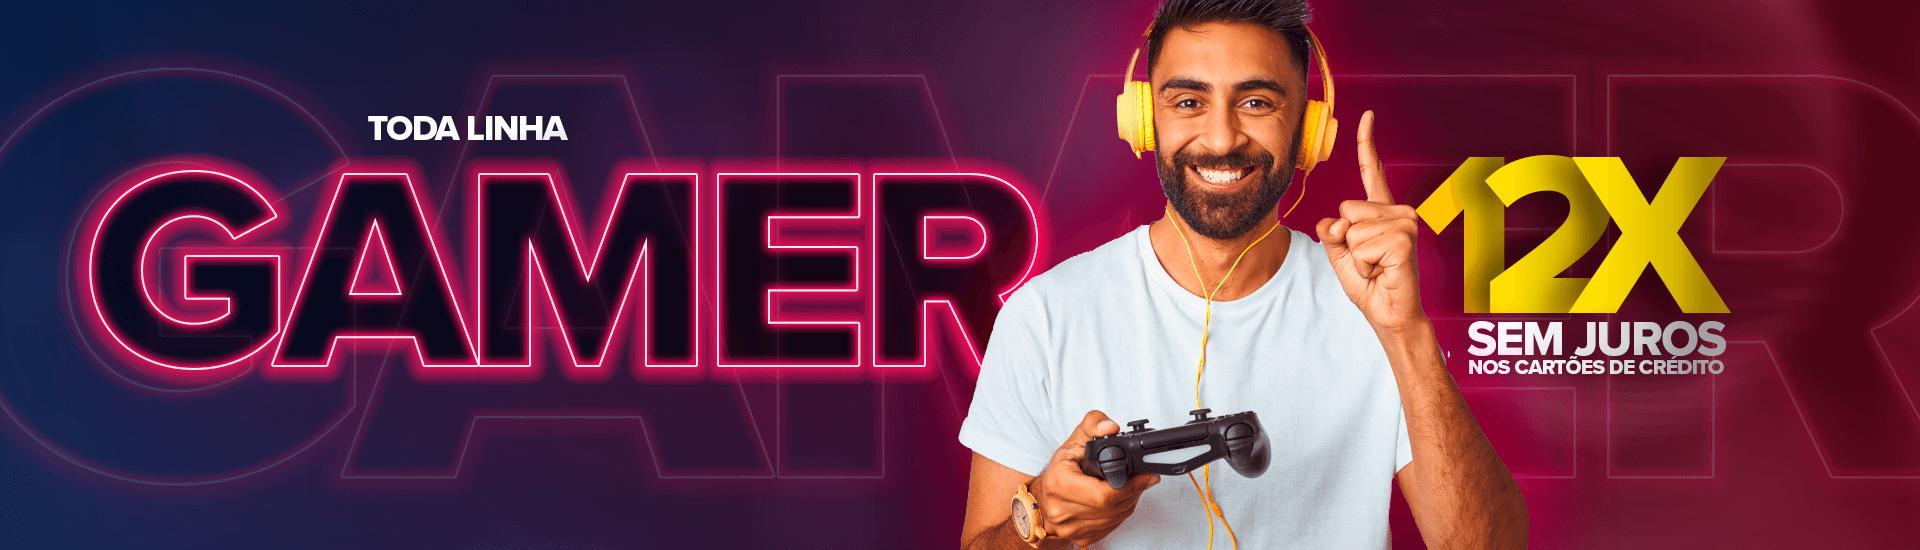 banner-games-desktop-1